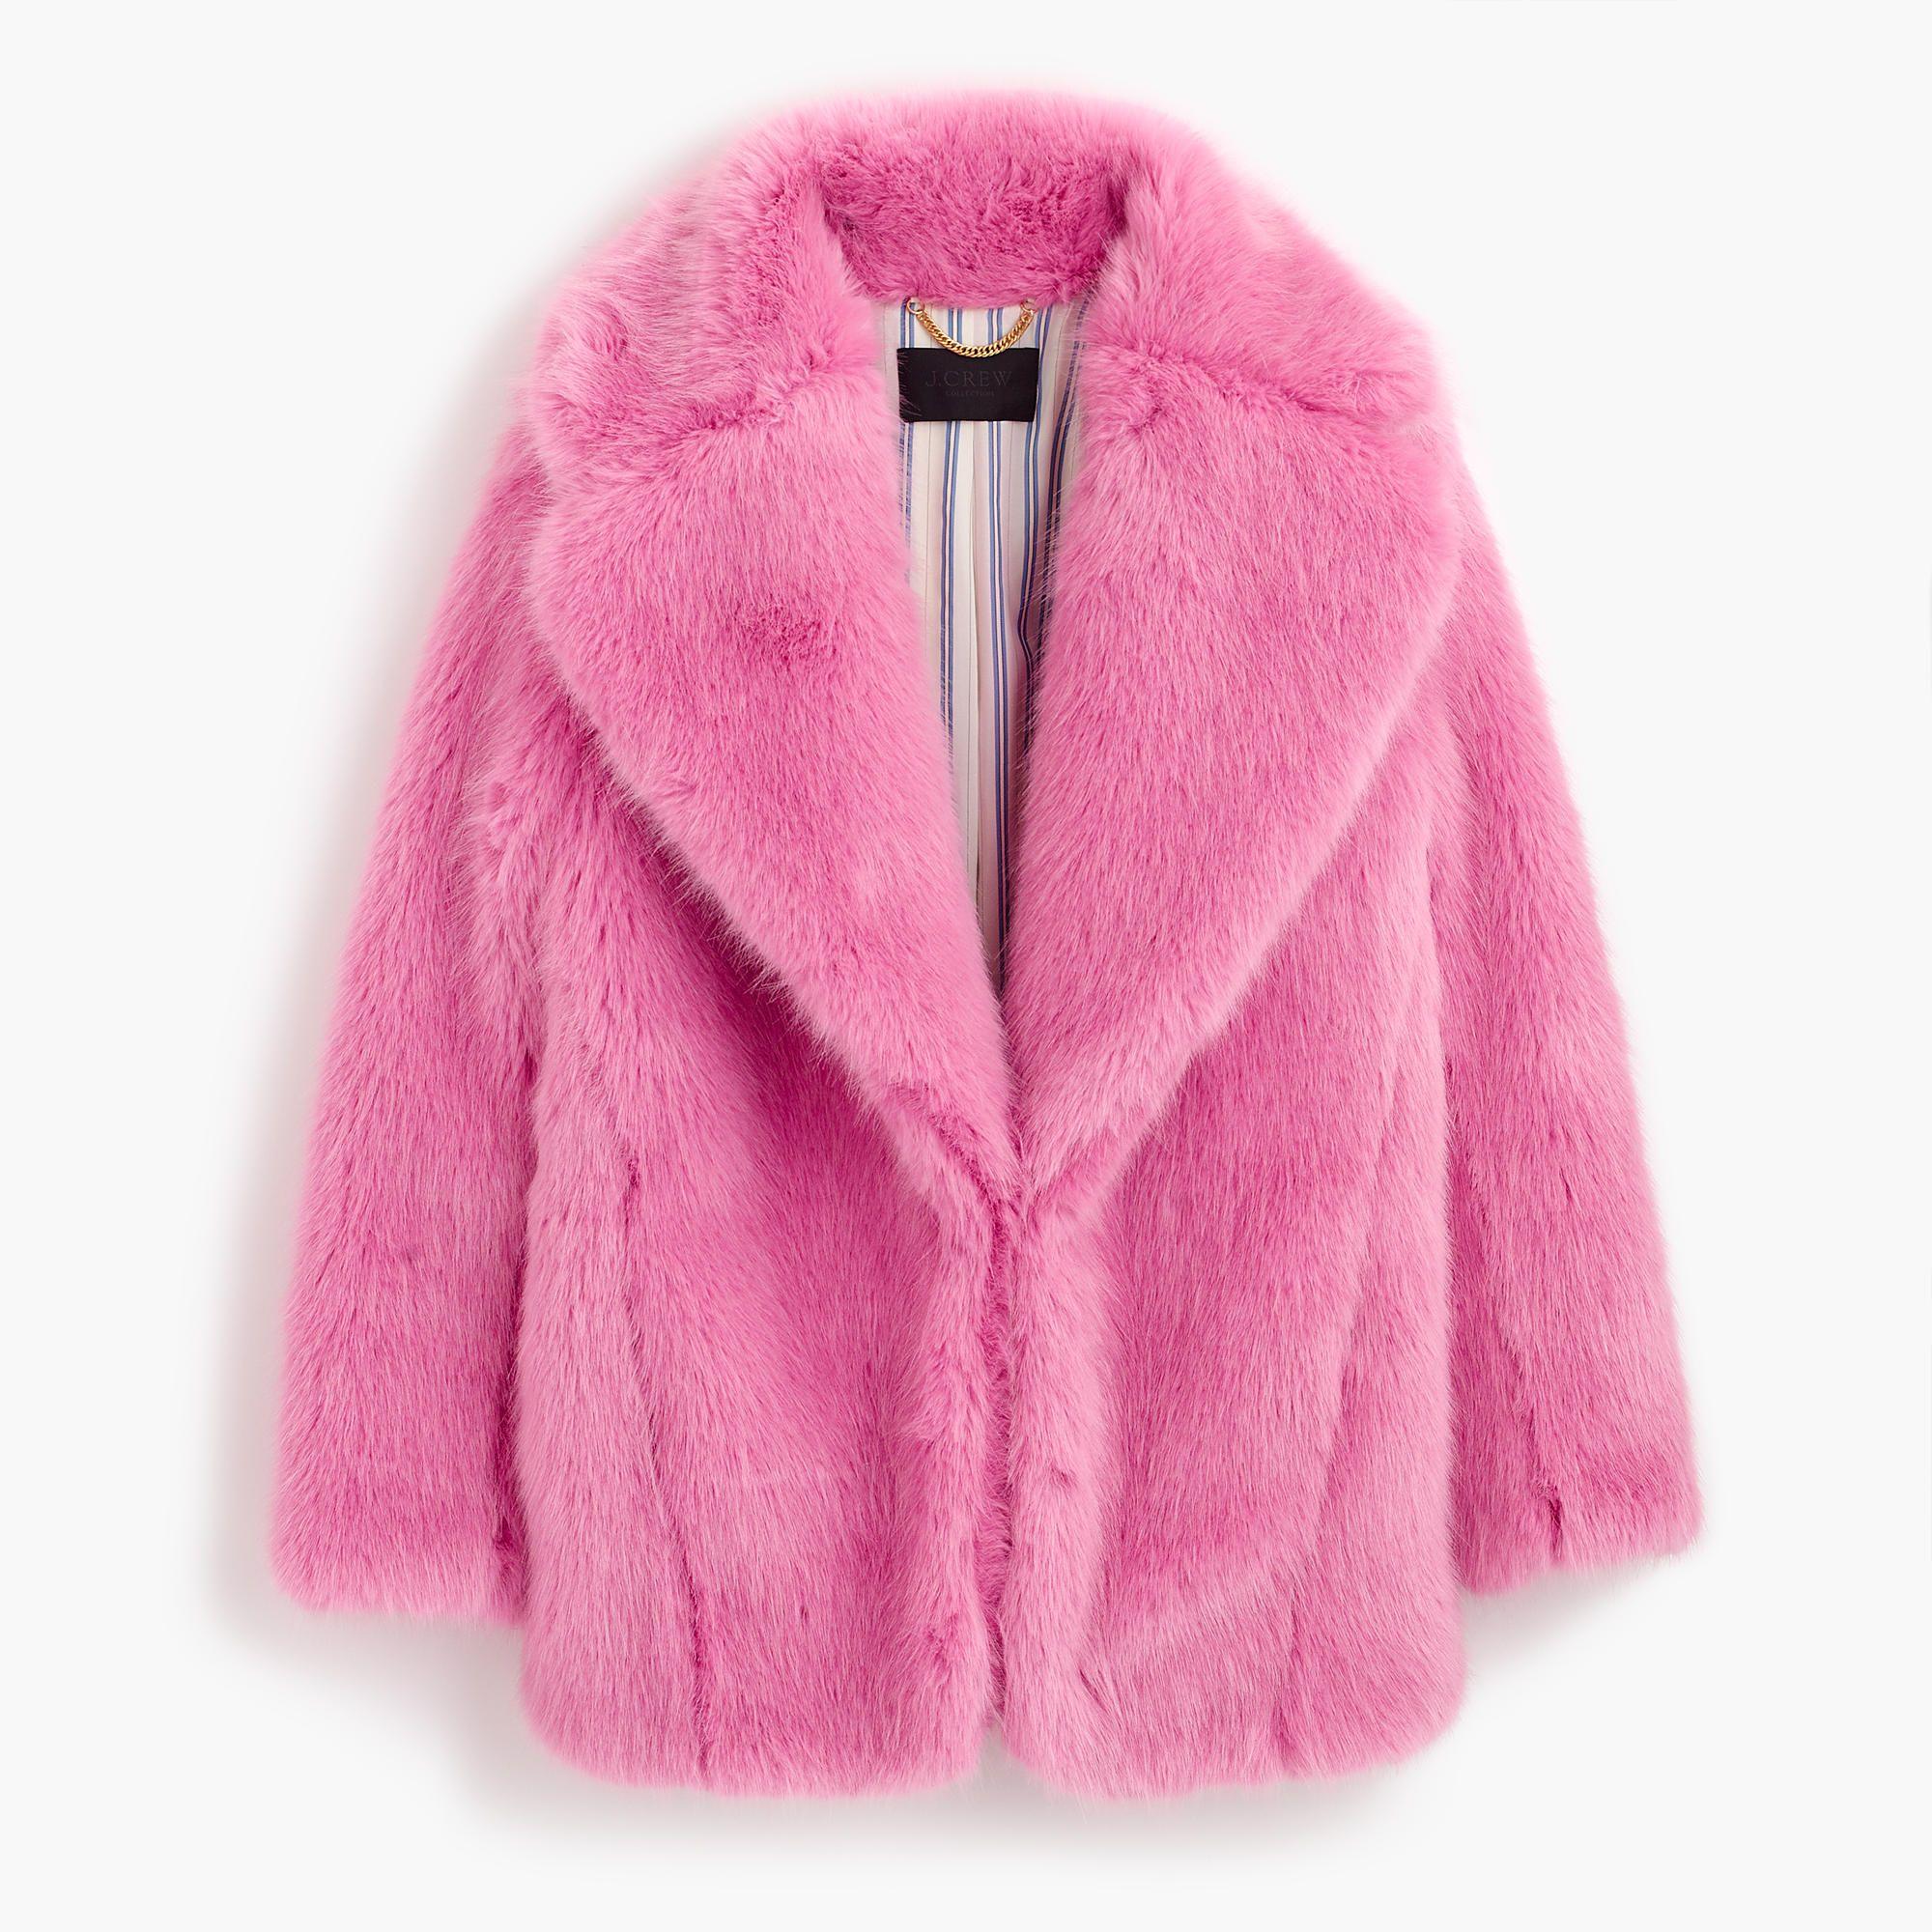 J Crew Collection Faux Fur Jacket Fur Jacket Pink Fur Coat Coats For Women [ 2000 x 2000 Pixel ]